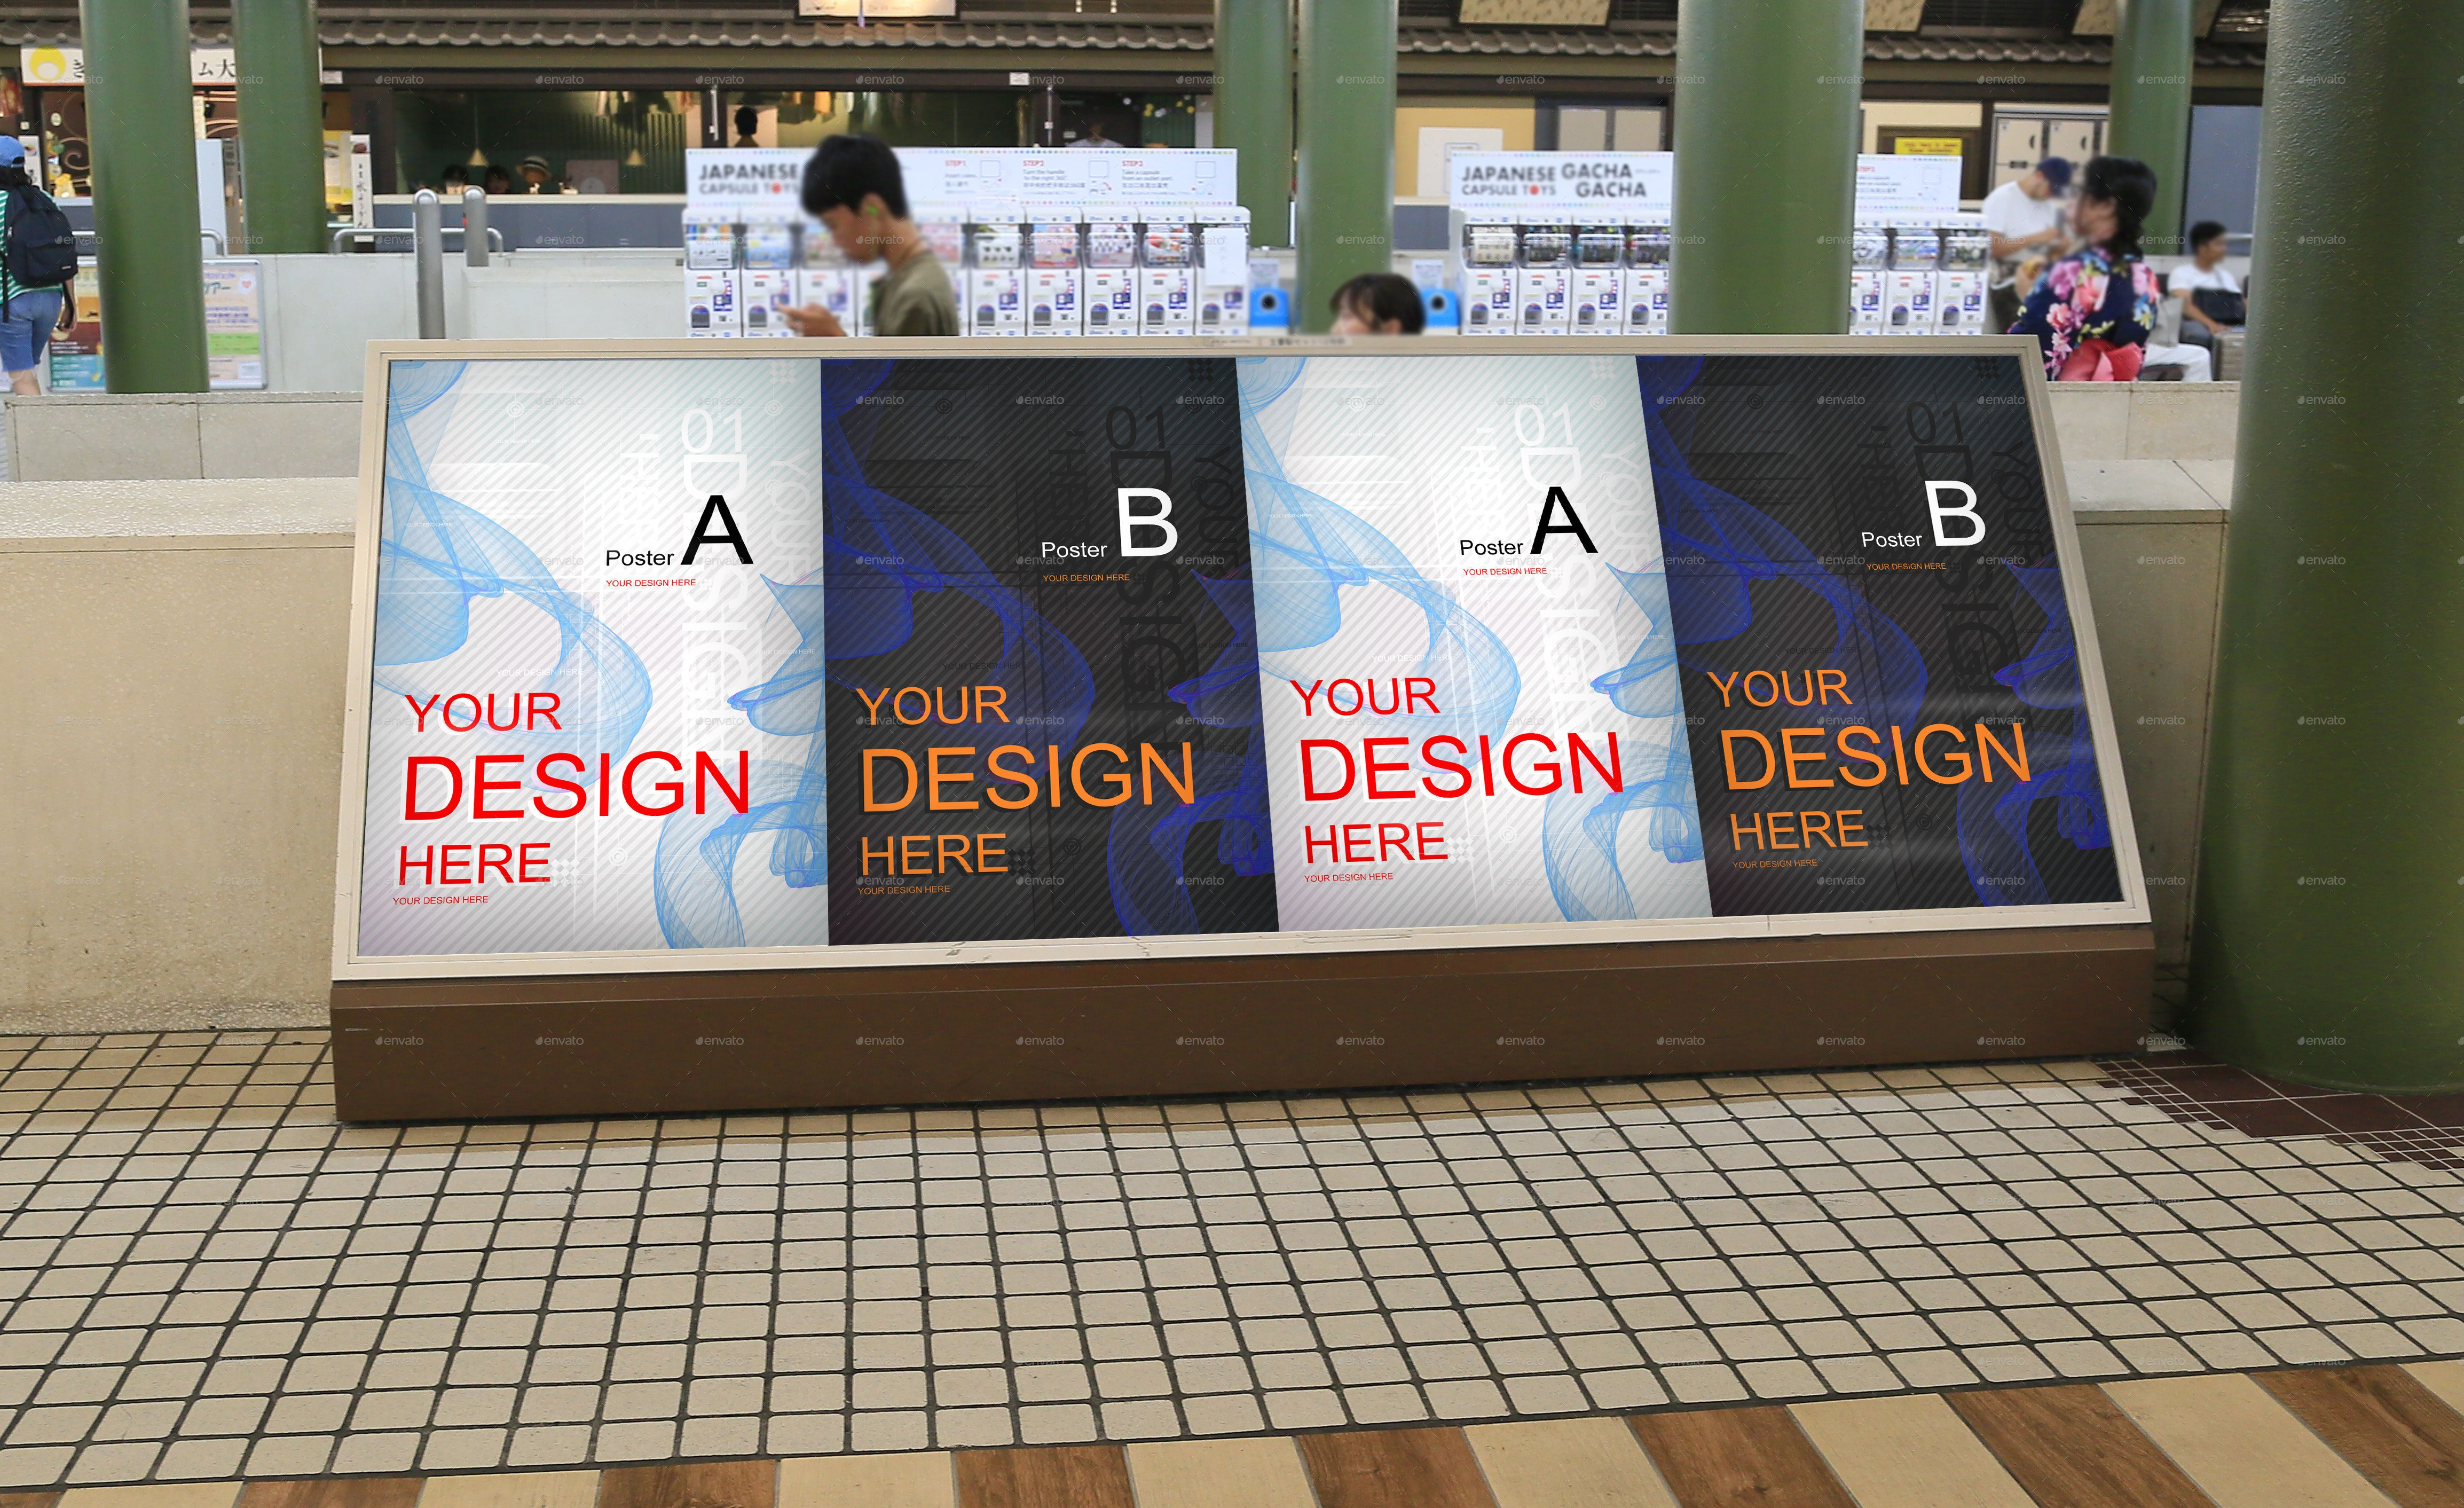 4 Poster Mockup Japan City Poster Mockup Creative Bookmarks Japan